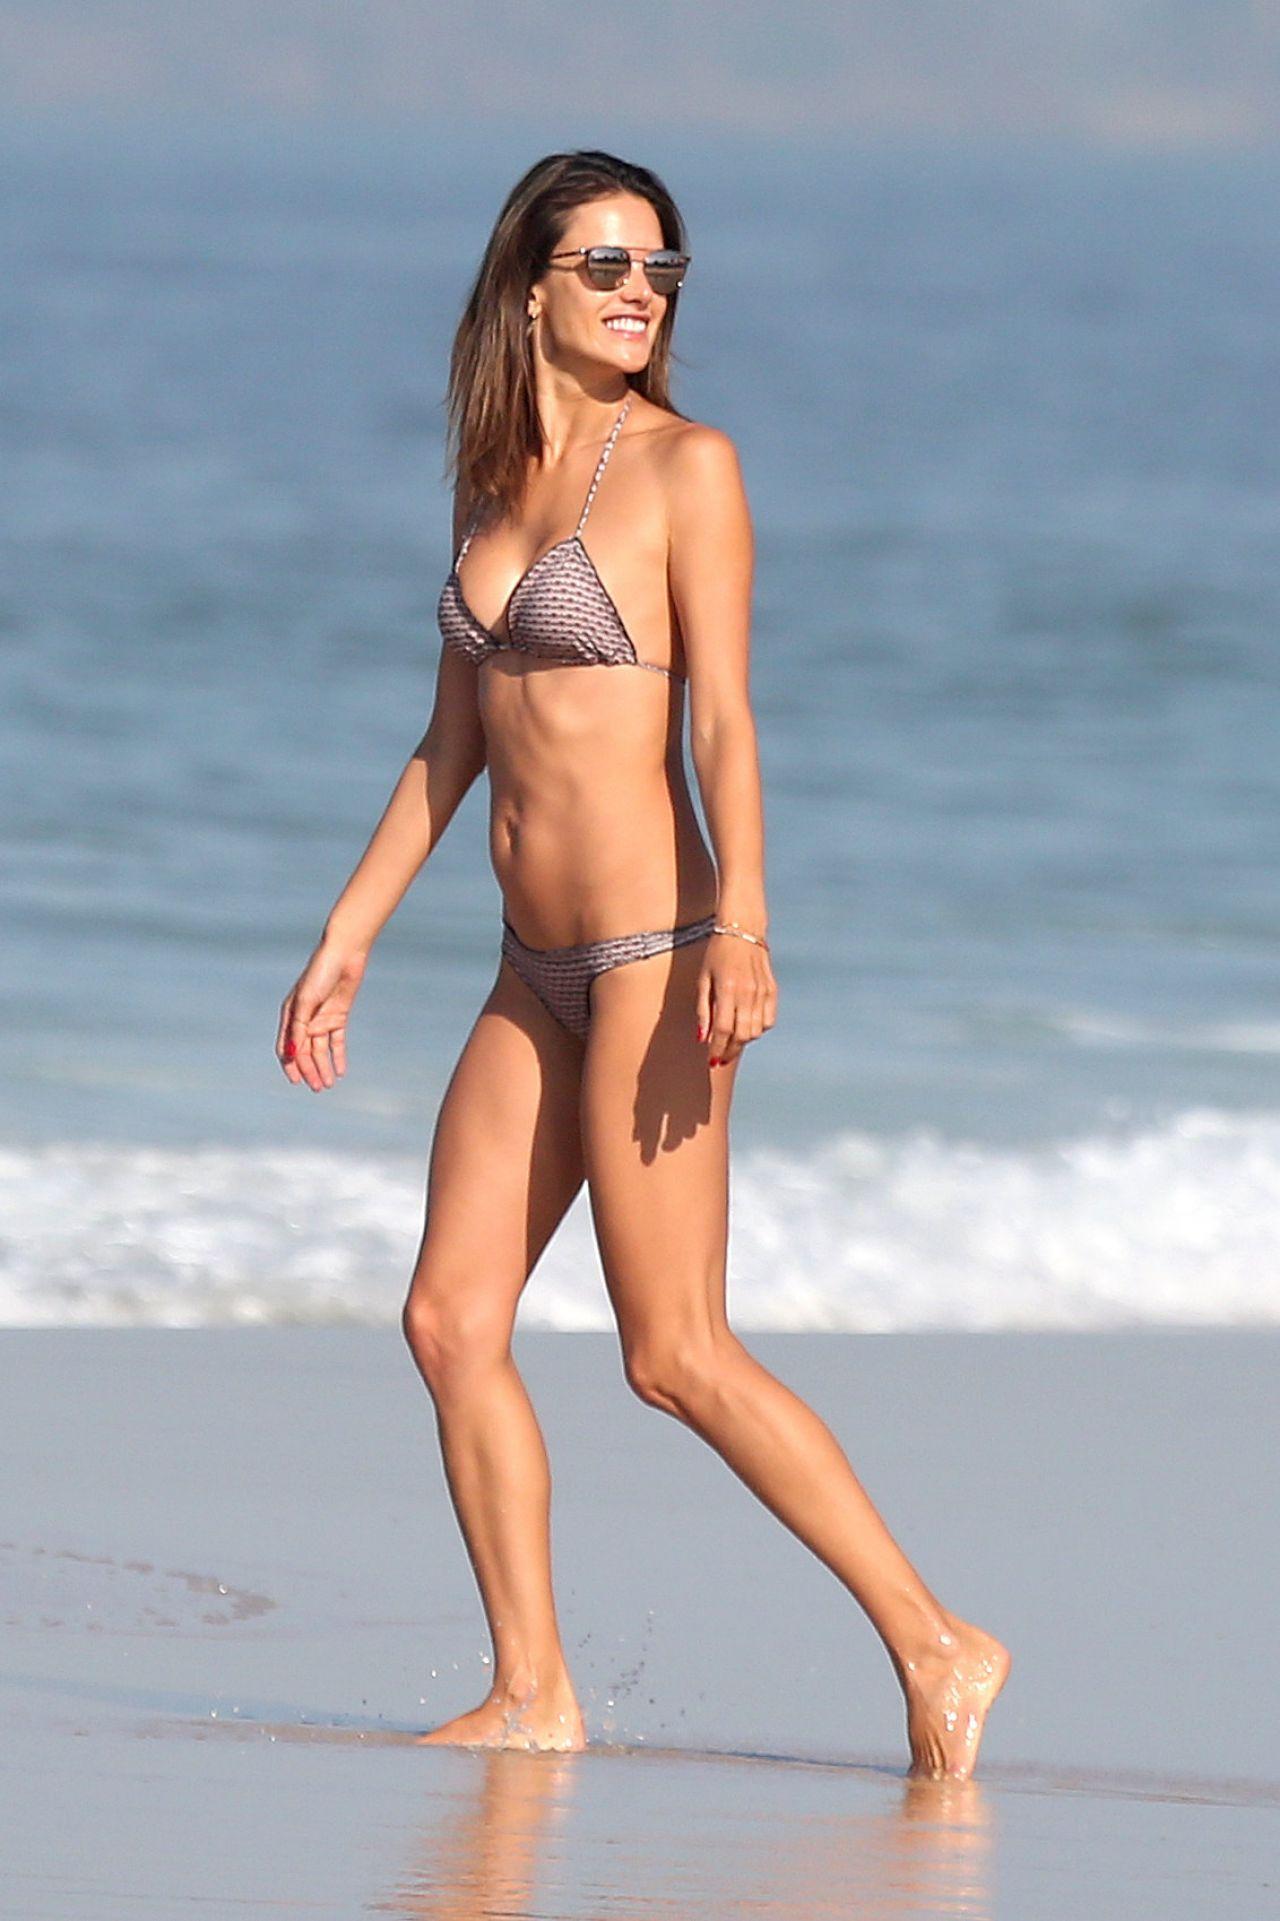 microkini beach girls